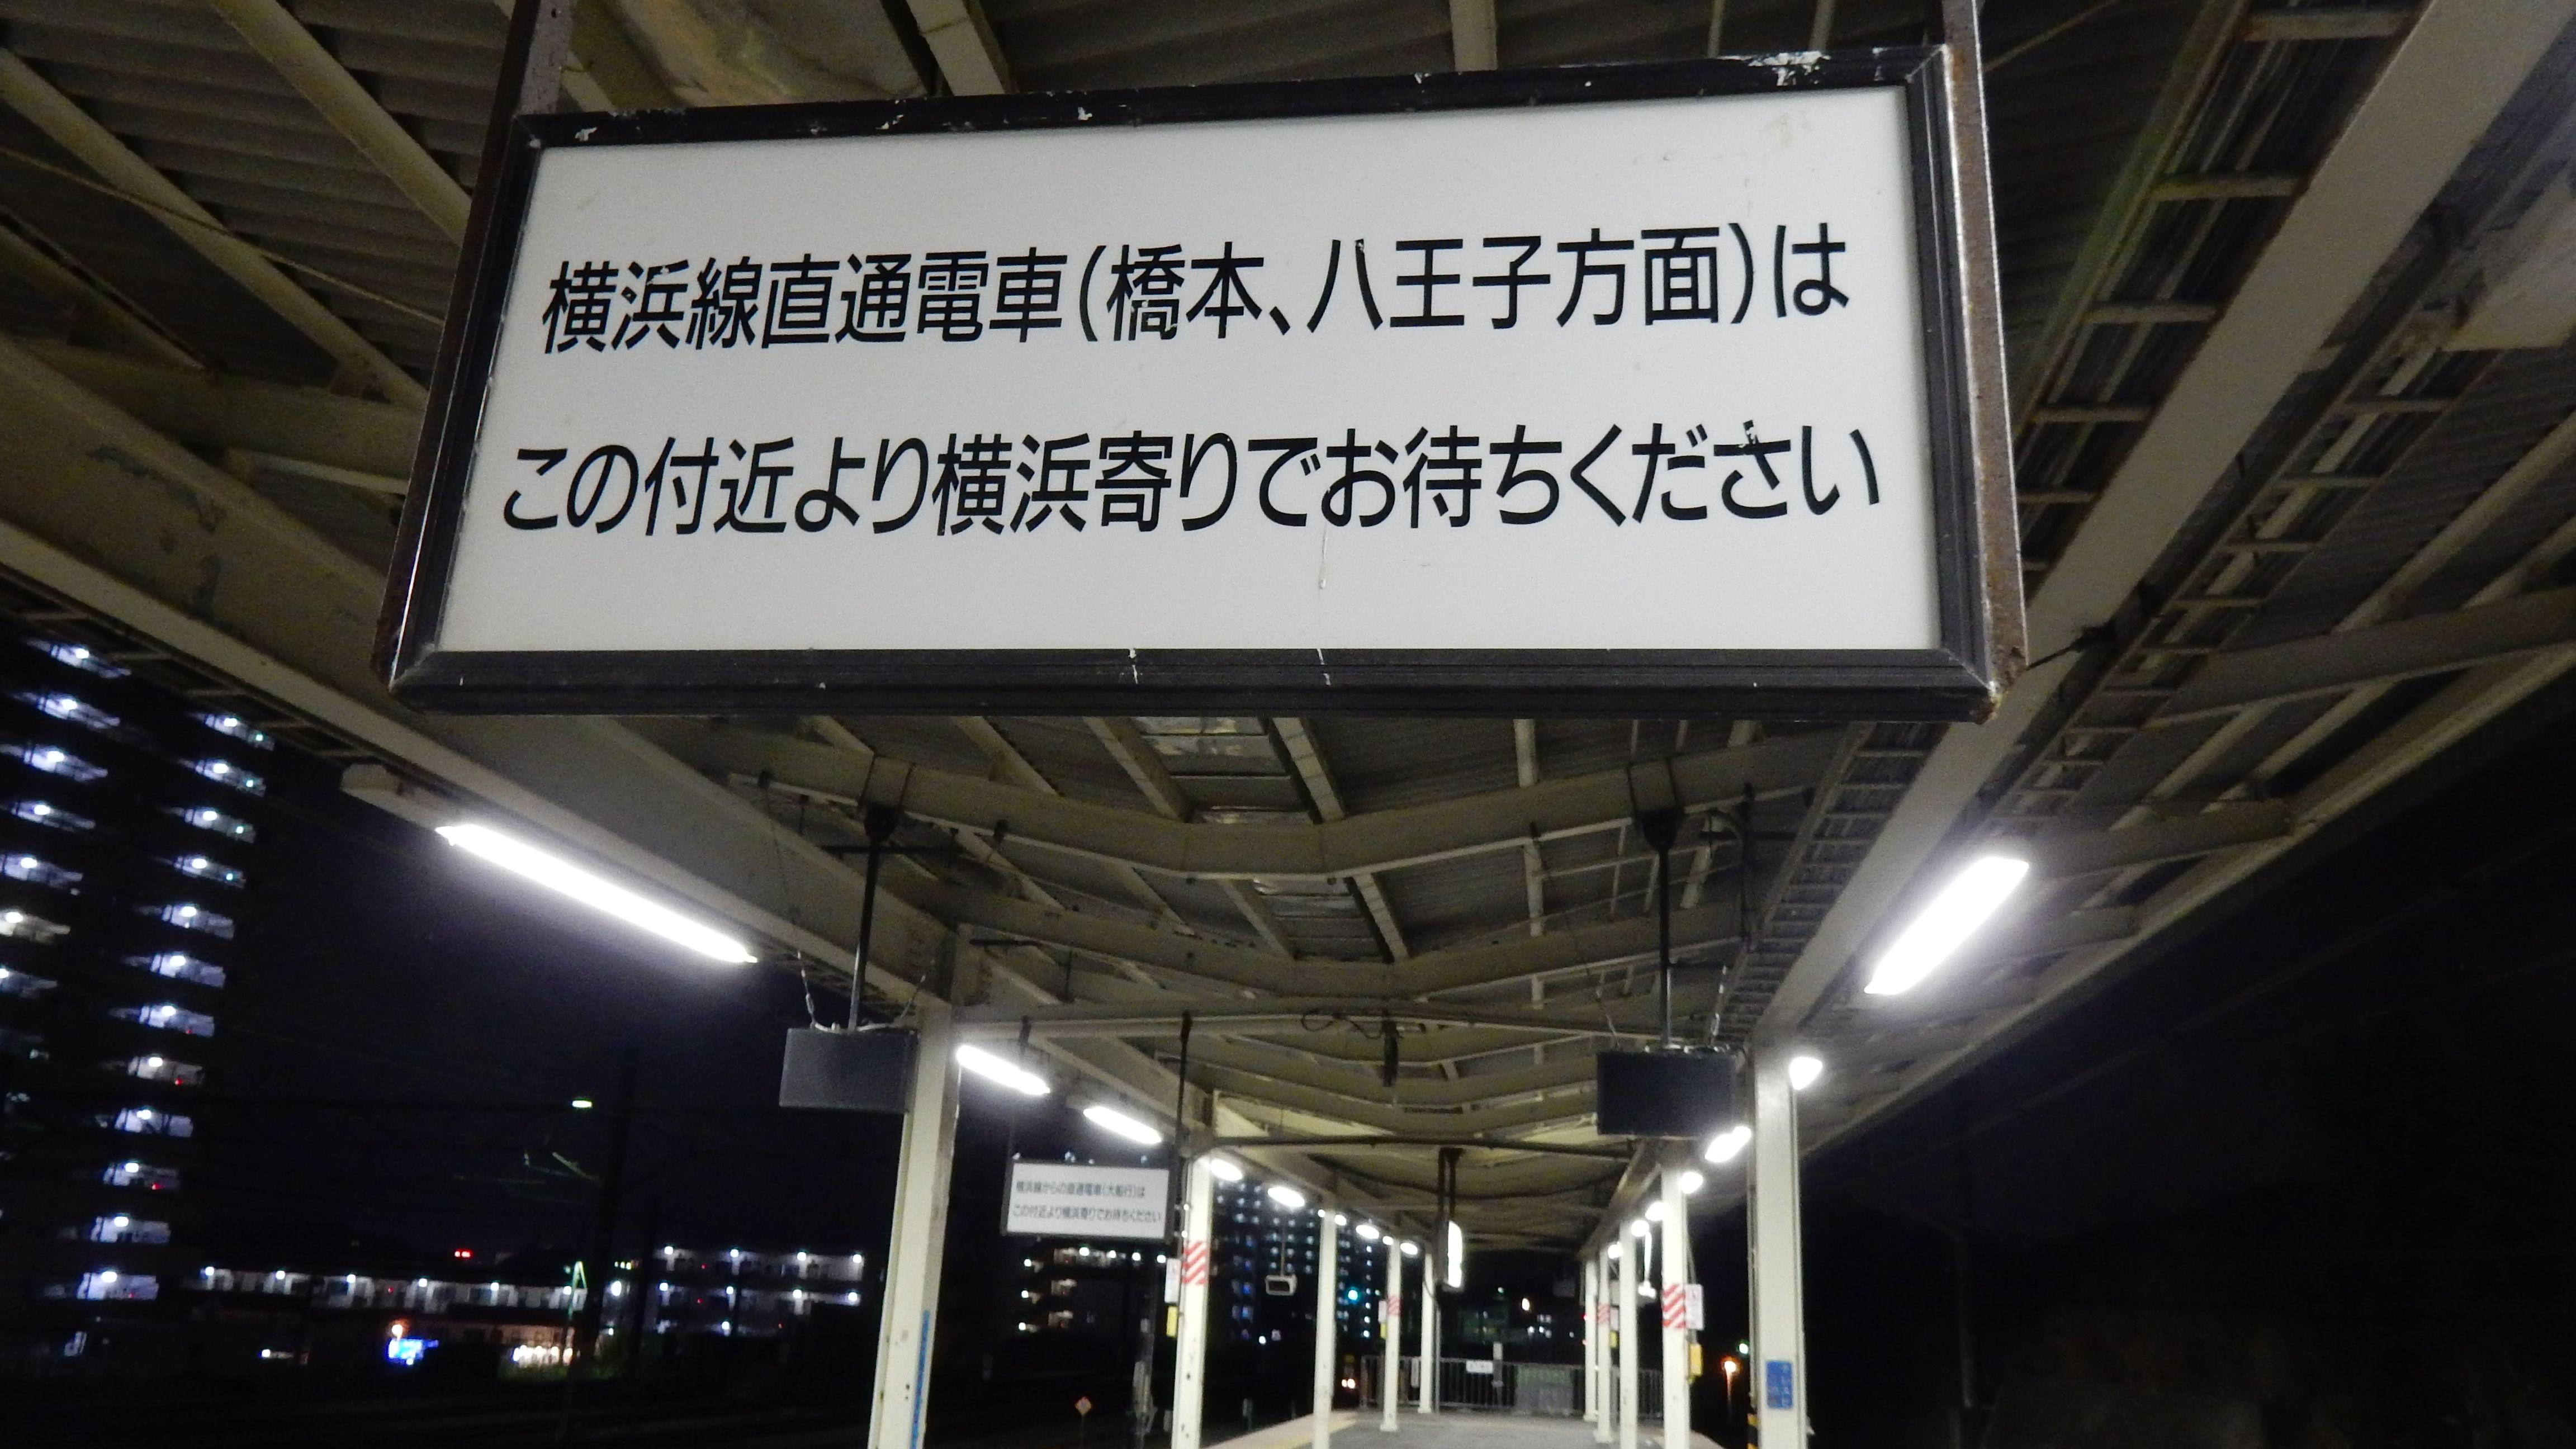 http://livedoor.blogimg.jp/matsunokih015/imgs/8/0/807bddee.jpg